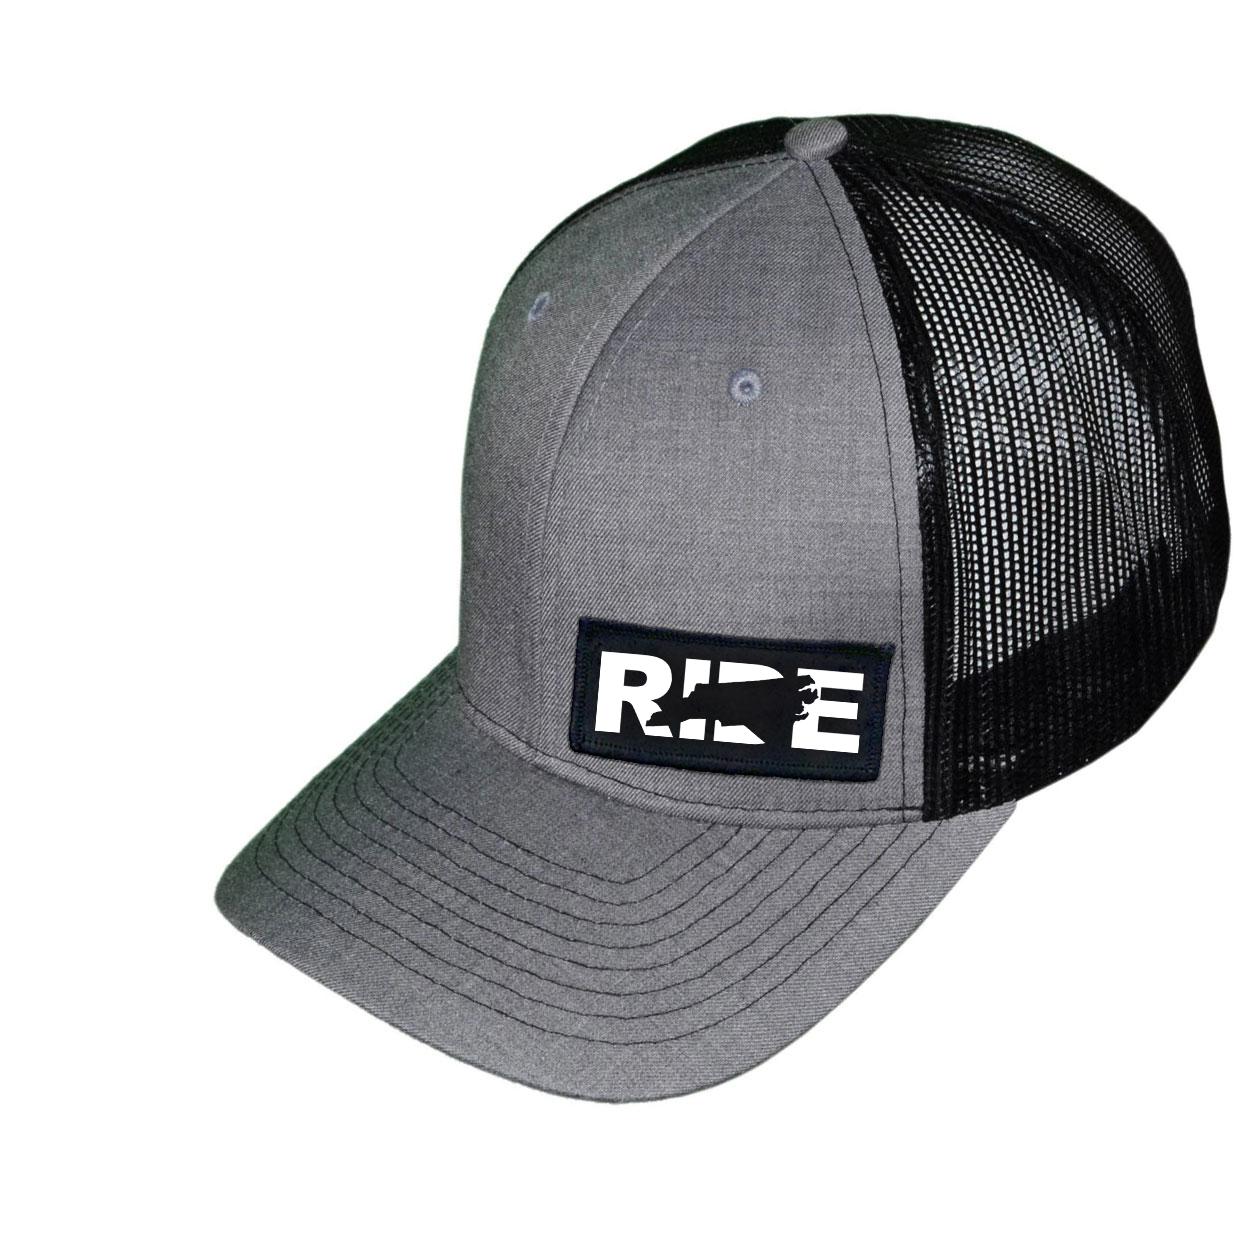 Ride North Carolina Night Out Woven Patch Snapback Trucker Hat Heather Gray/Black (White Logo)